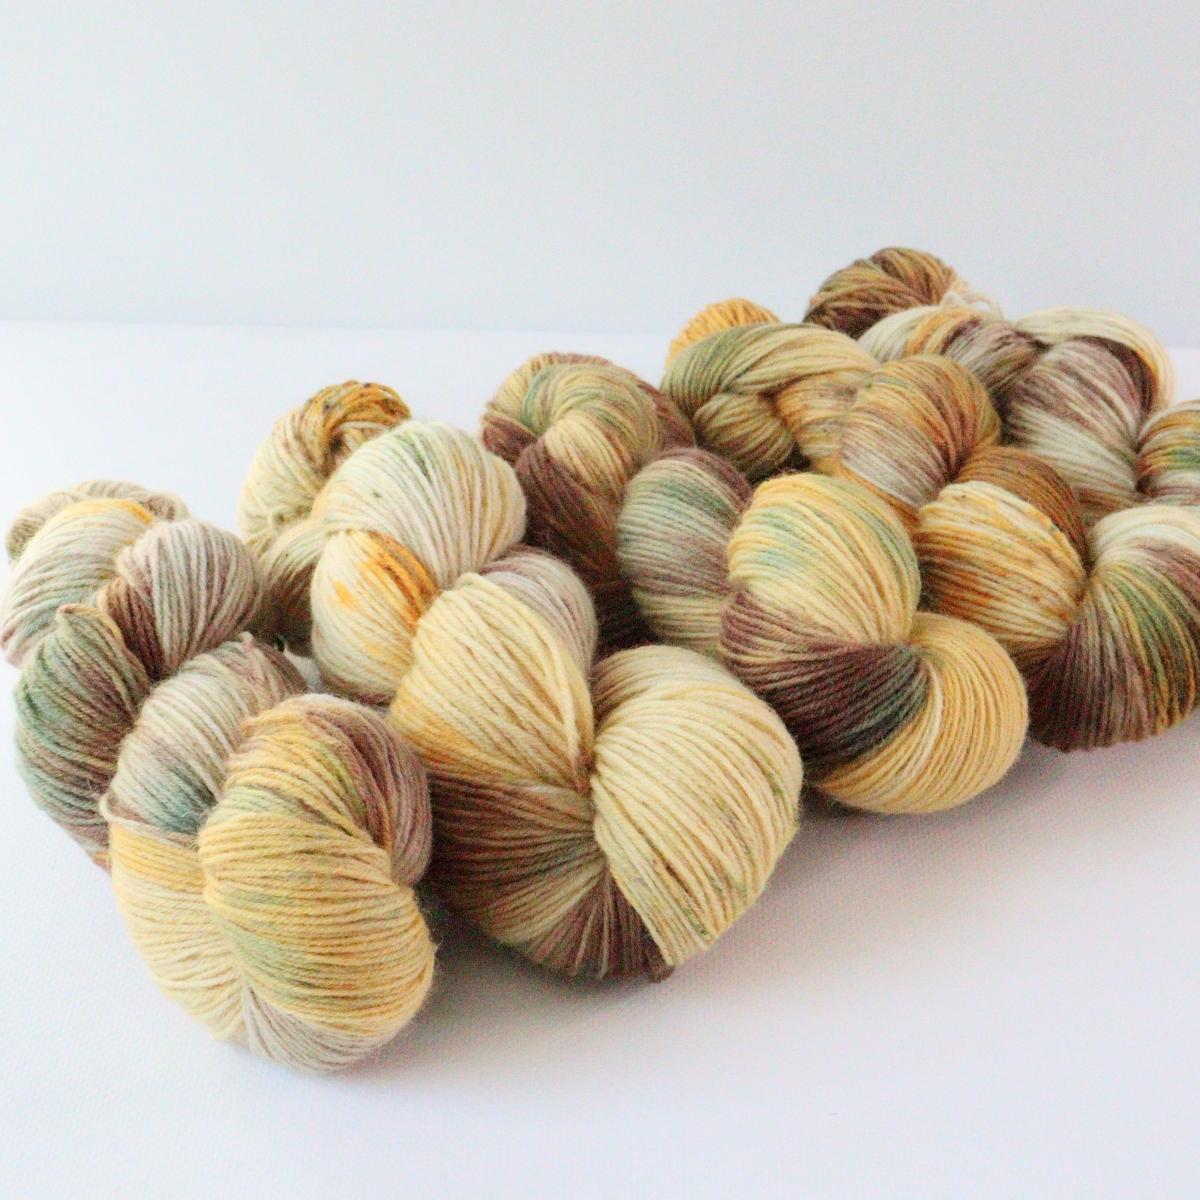 woodico.pro hand dyed yarn 088 2 1200x1200 - Hand dyed yarn / 088